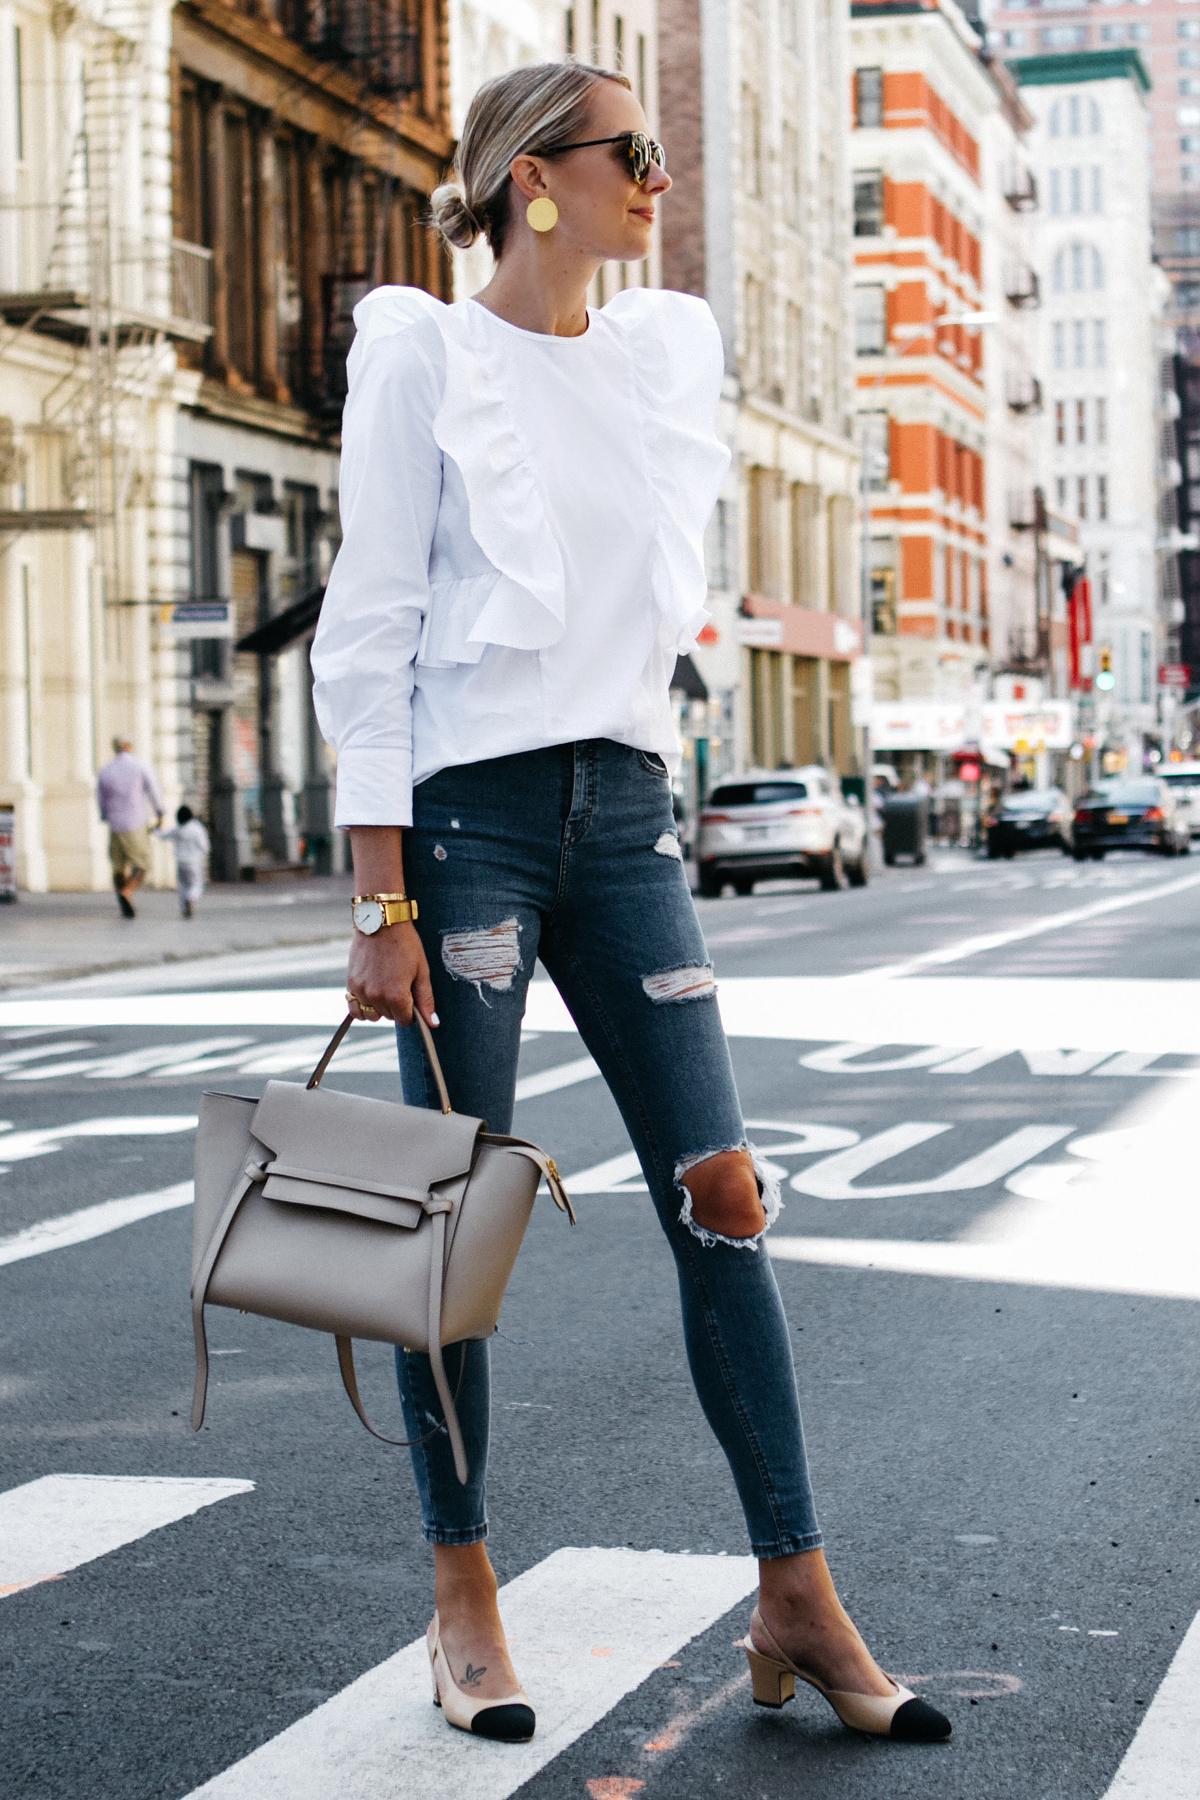 Blonde Woman Wearing Zara White Ruffle Shirt Topshop Denim Ripped Skinny Jeans Chanel Slingbacks Celine Belt Bag Fashion Jackson Dallas Blogger Fashion Blogger Street Style NYFW